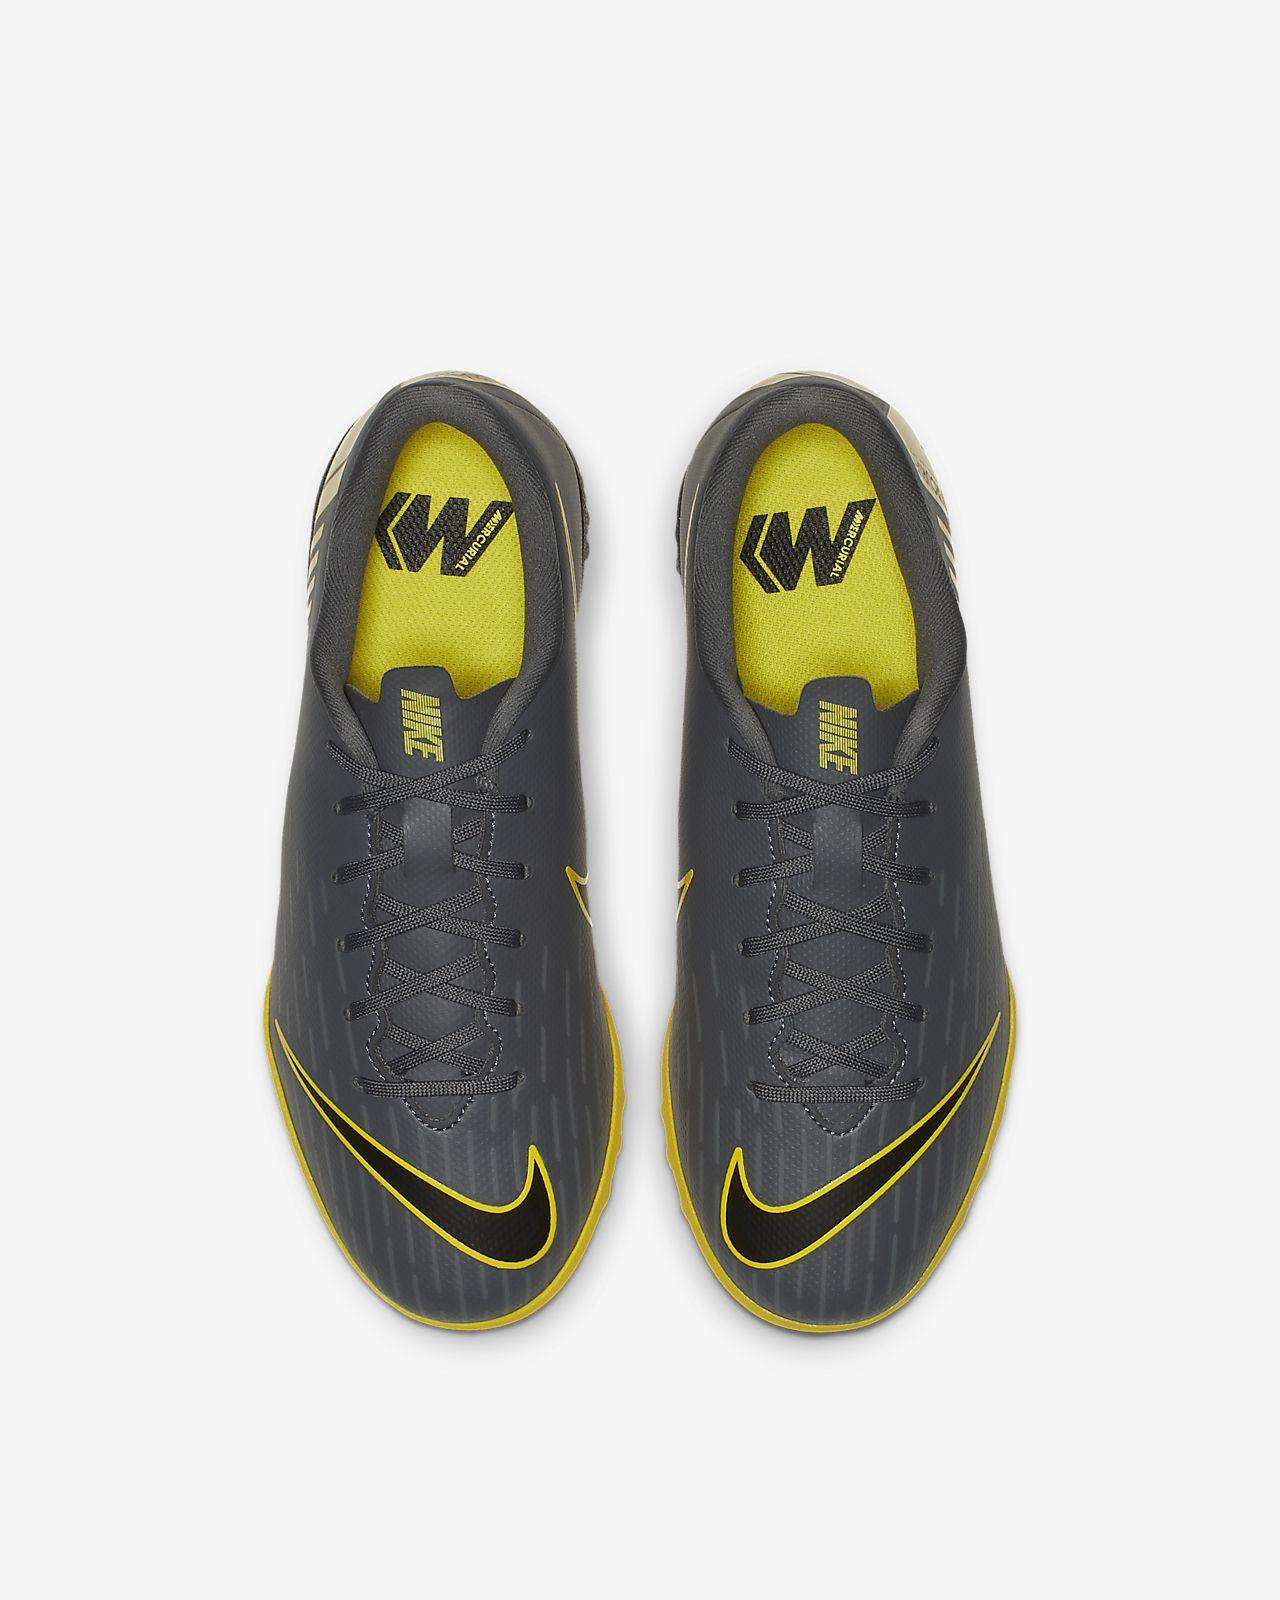 buy popular f91ed 559d7 ... Nike Jr. MercurialX Vapor XII Academy Younger Older Kids  Turf Football  Shoe